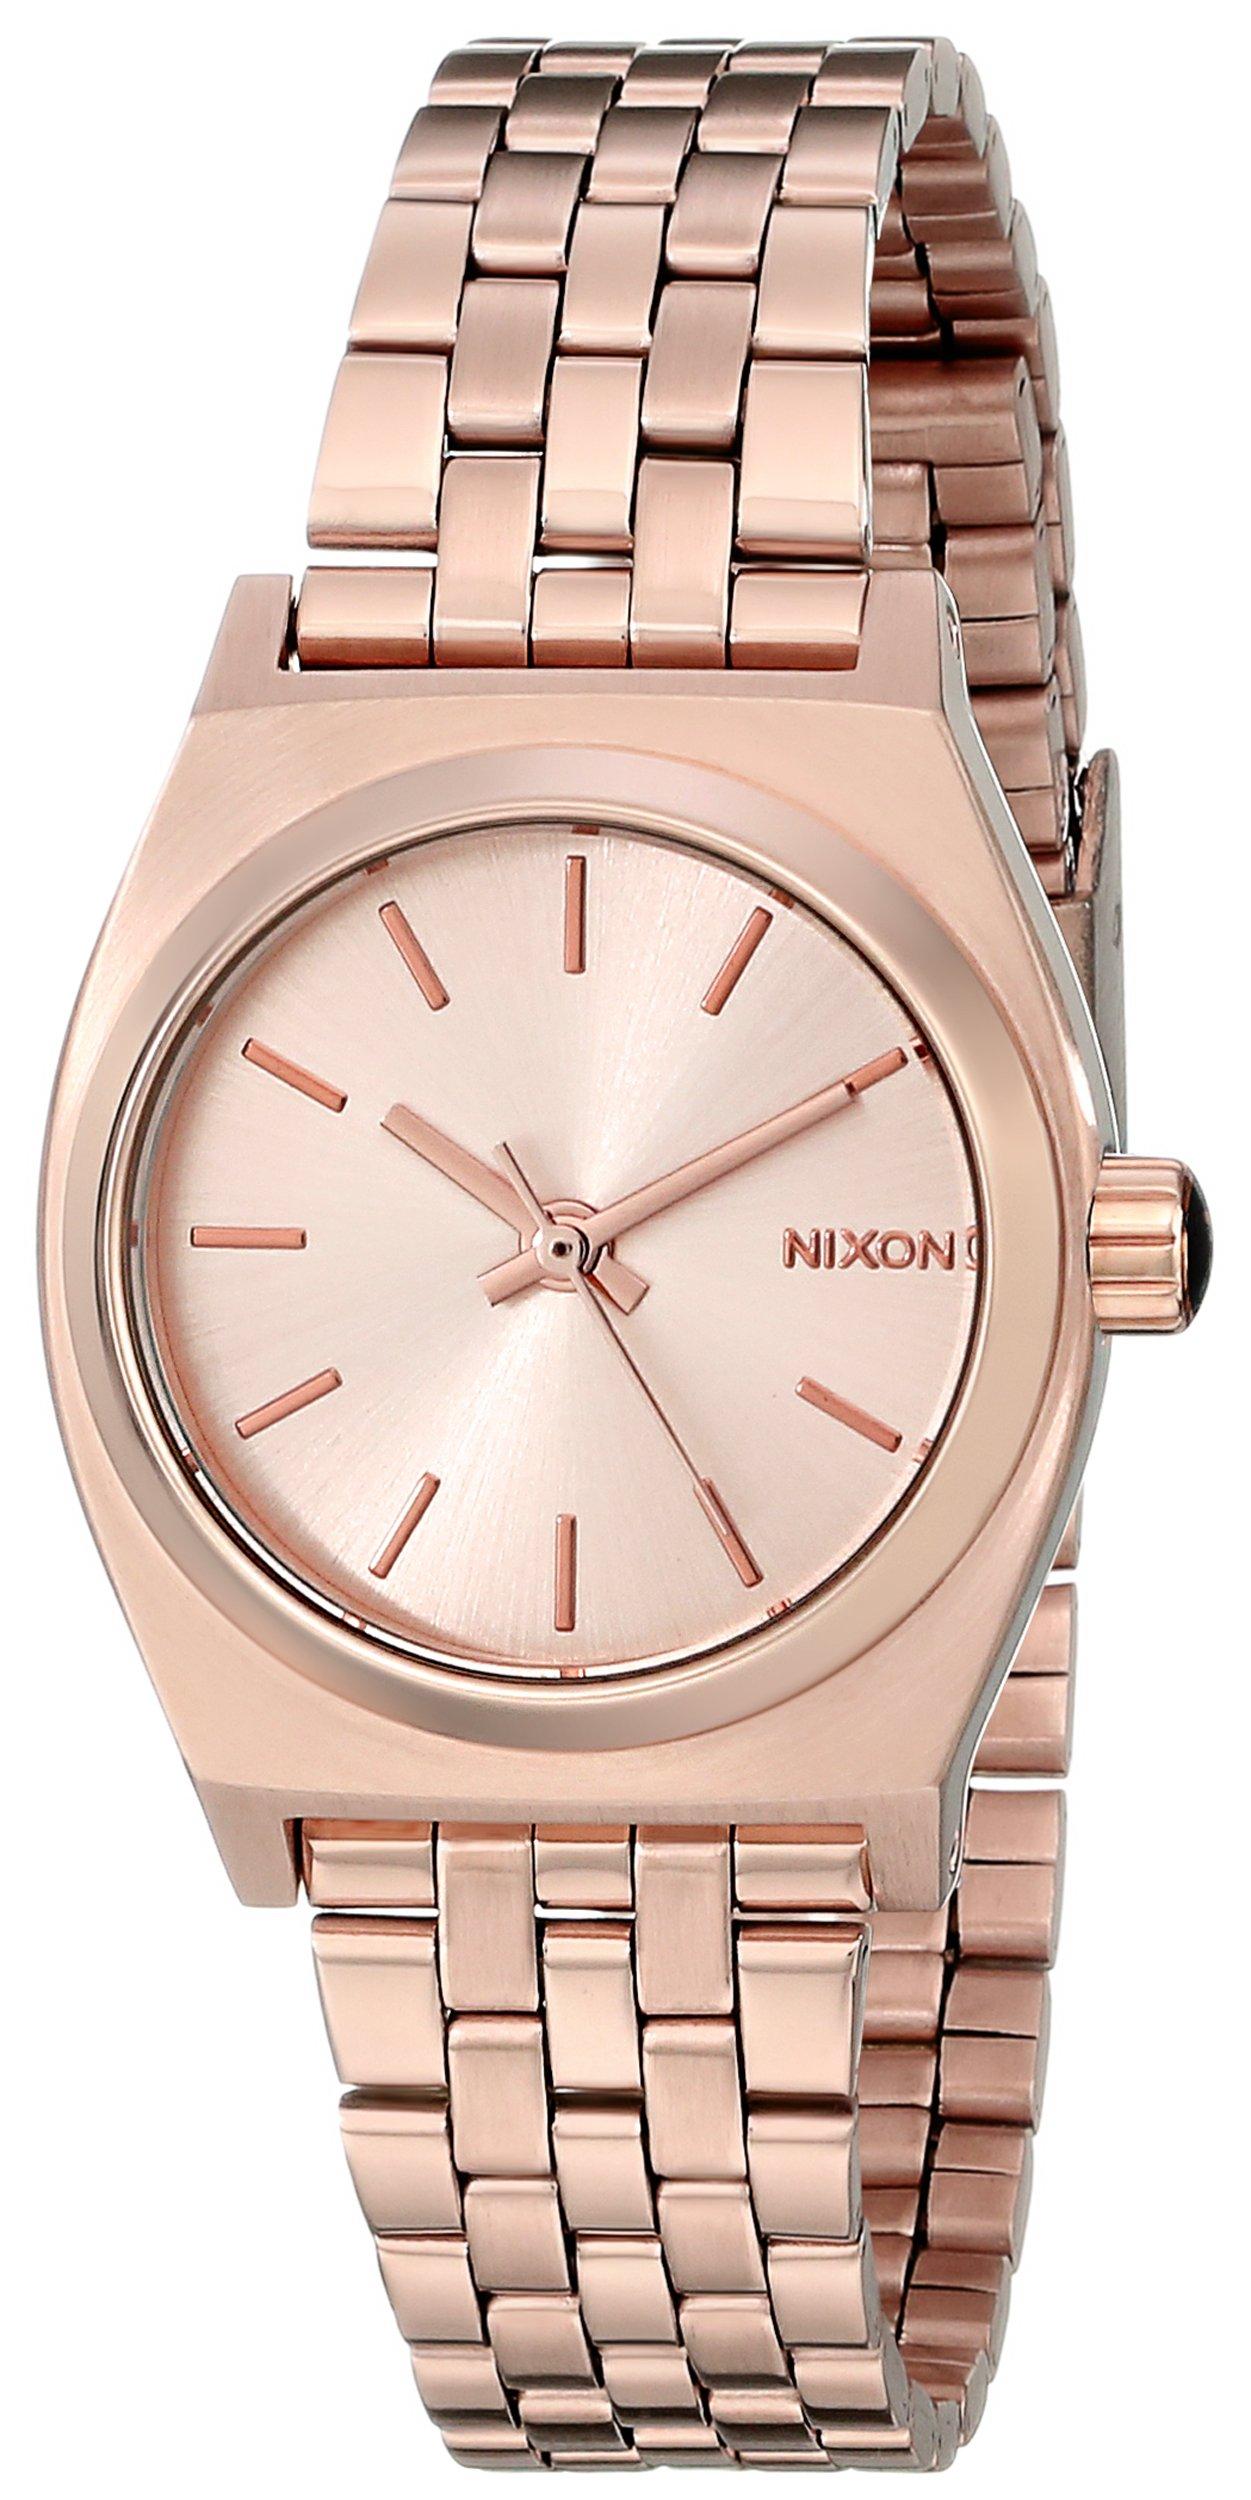 Nixon Women's A399897 Small Time Teller Watch